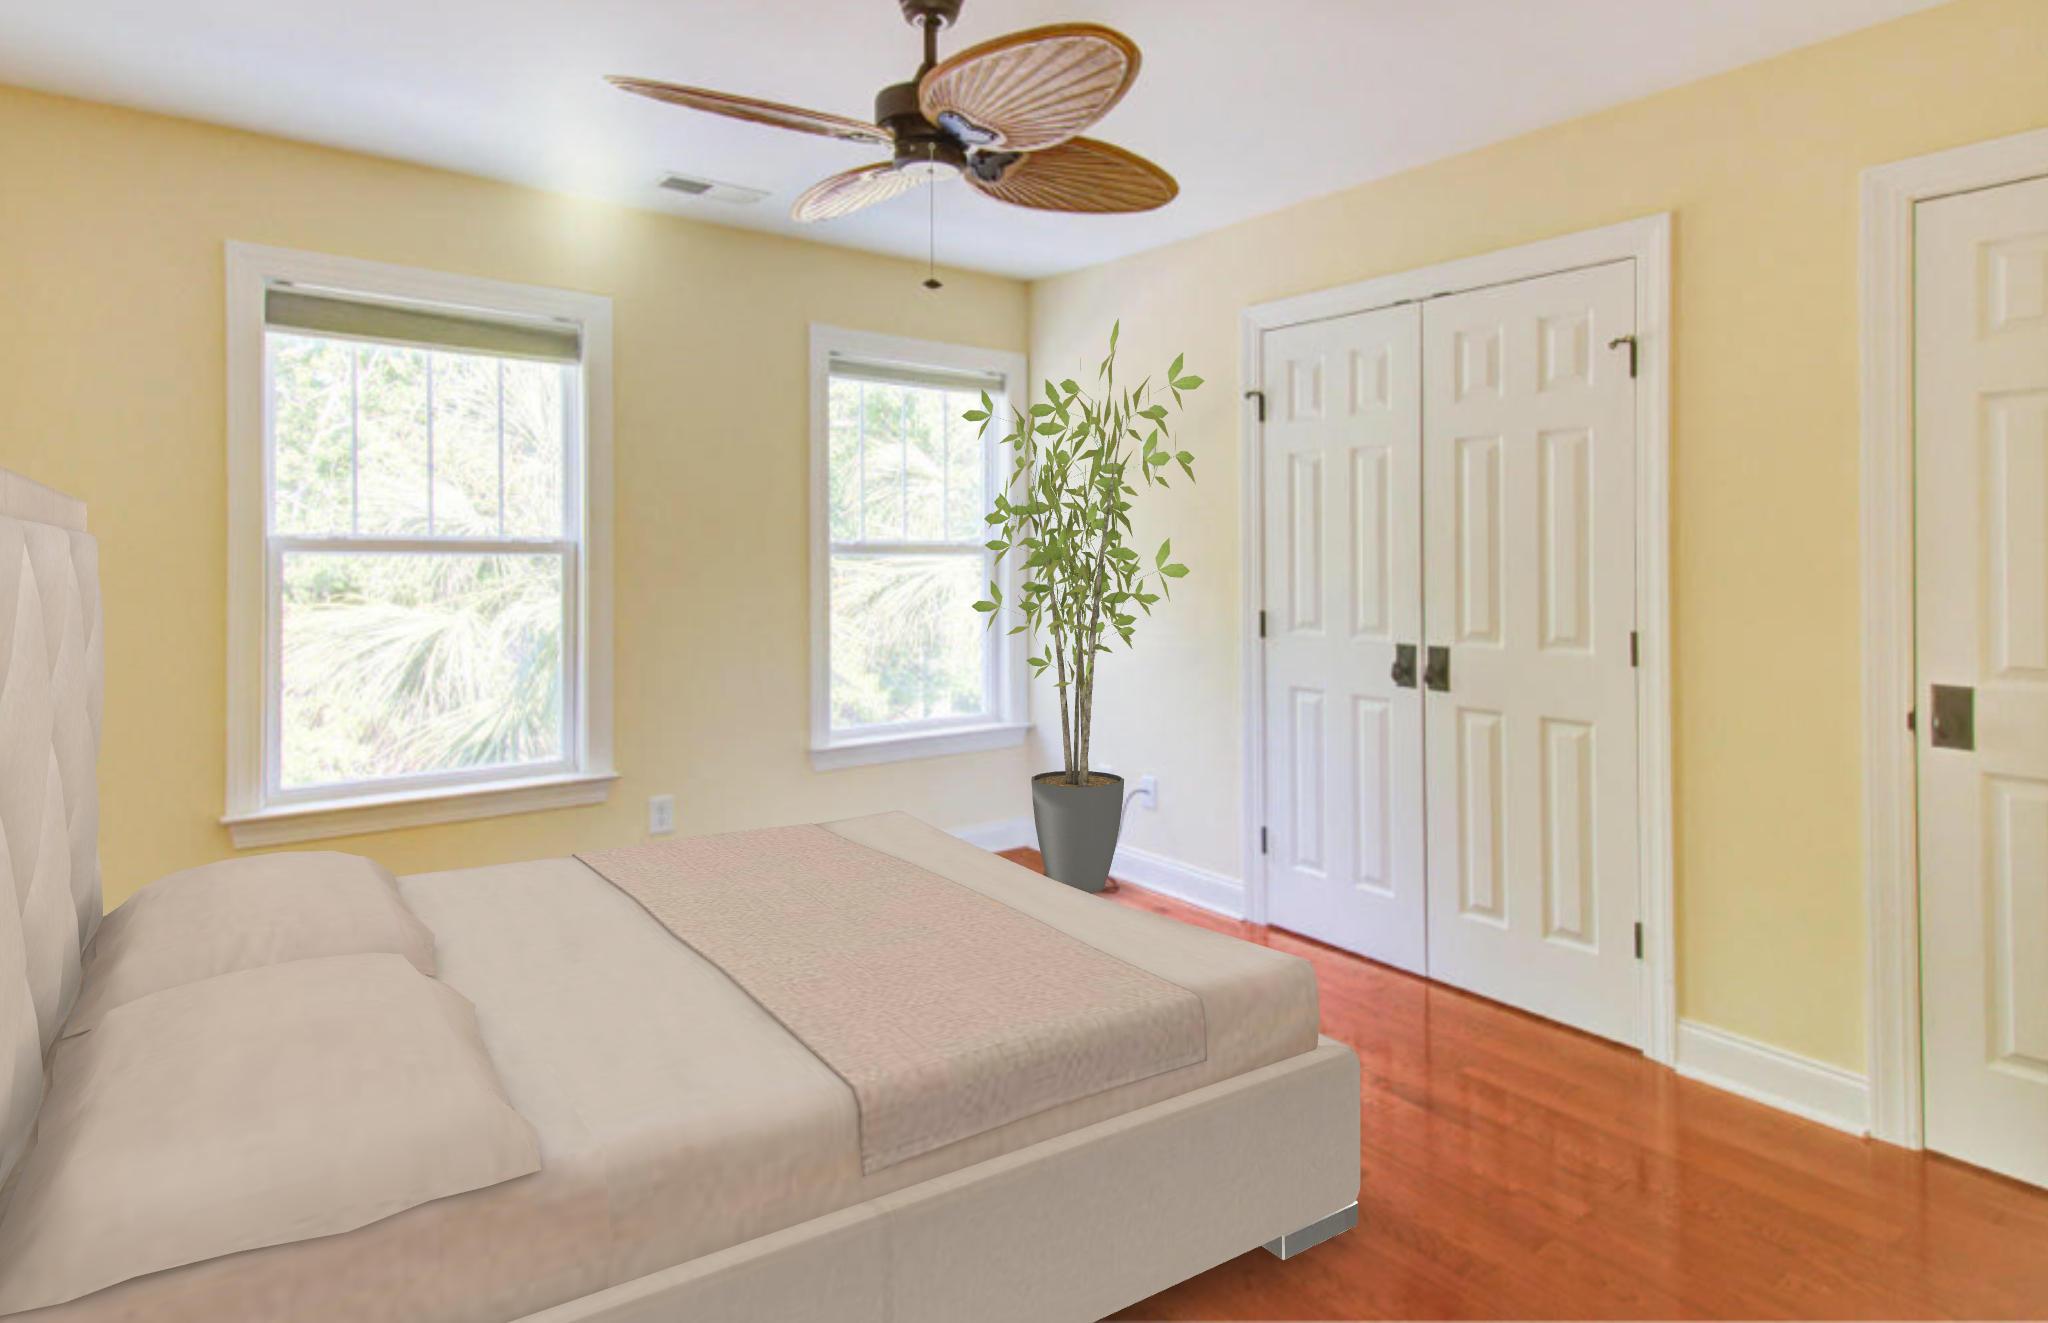 Center Park Homes For Sale - 950 Crossing, Daniel Island, SC - 44